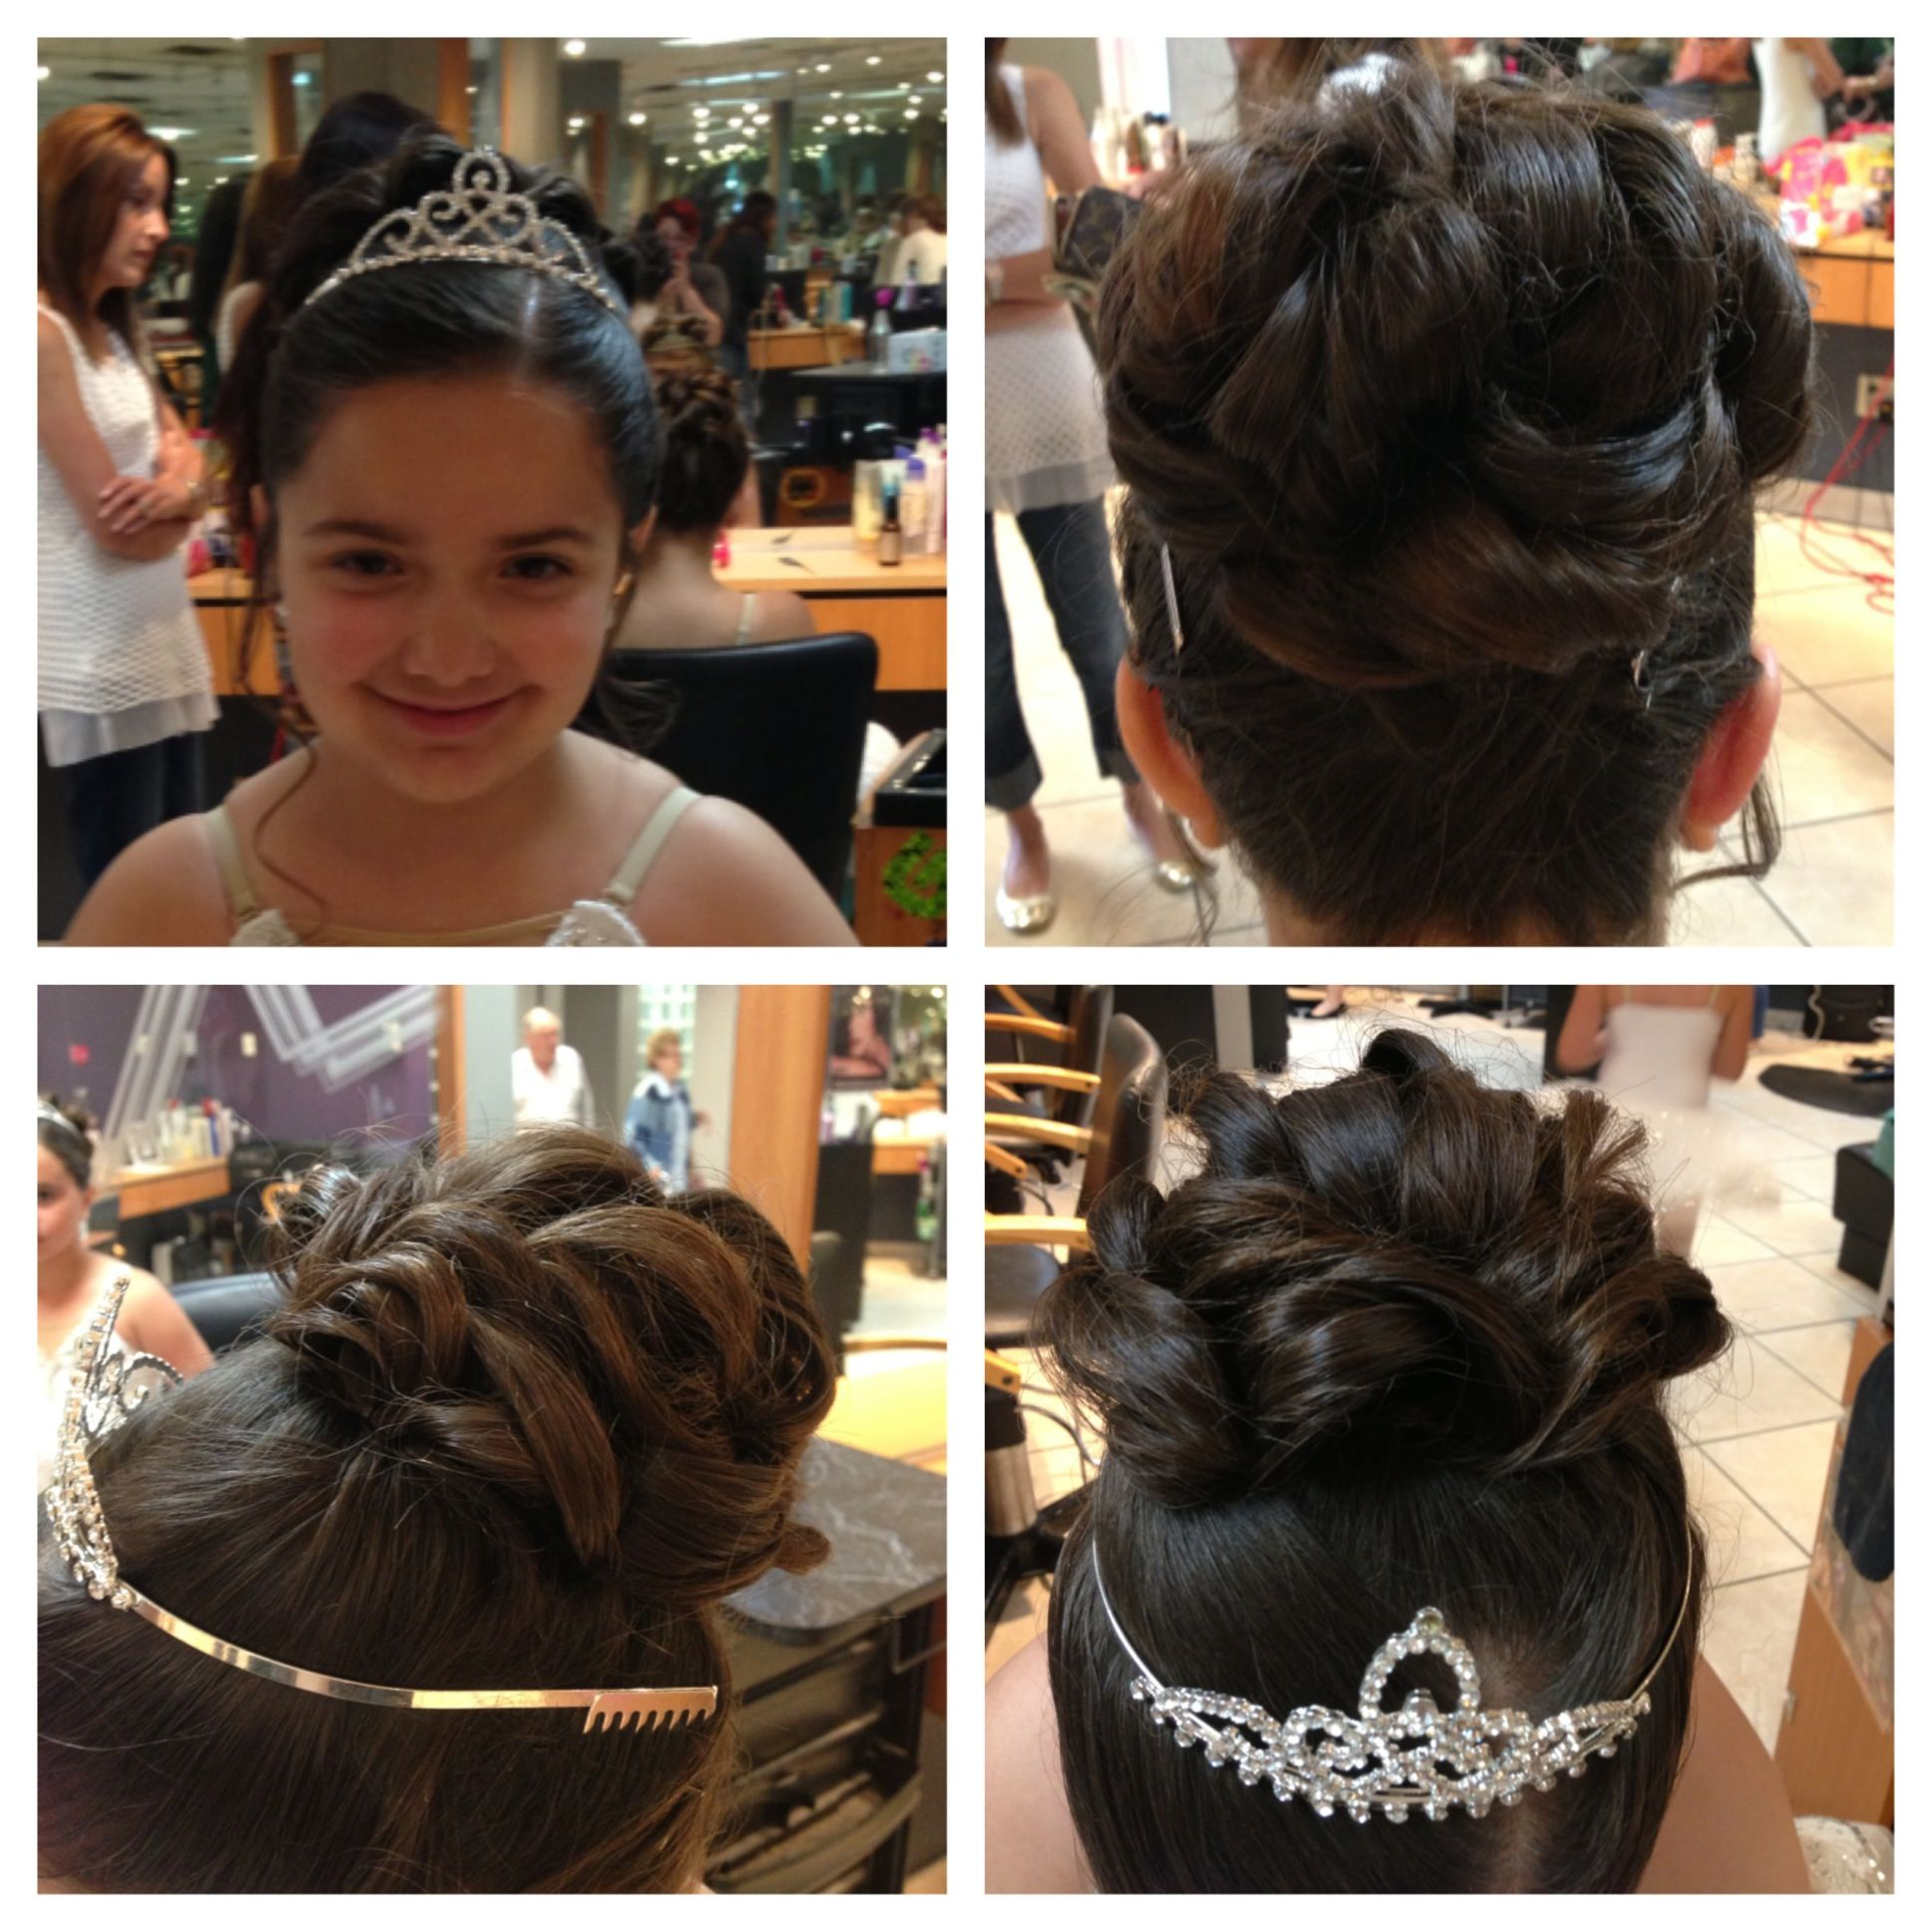 communion updo, curly bun | hair by maia | curly bun, hair